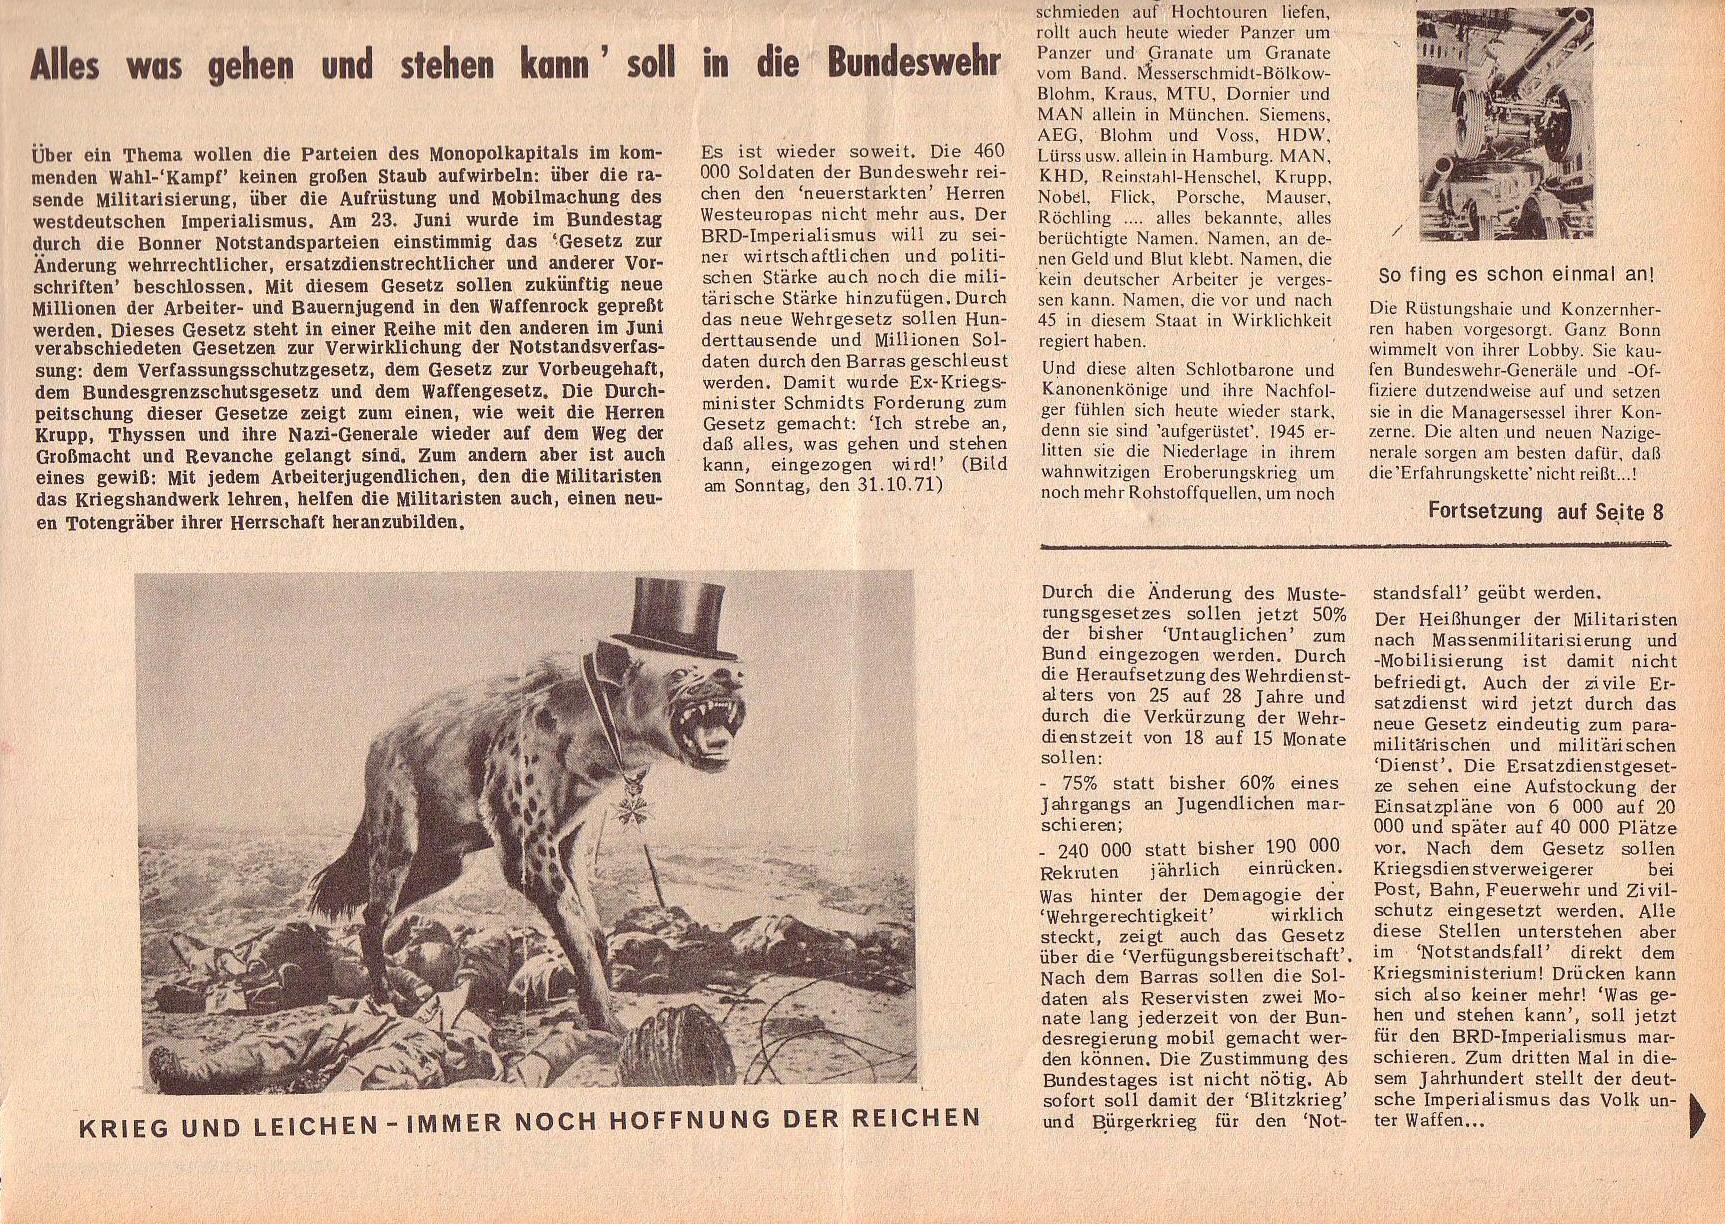 Roter Morgen, 6. Jg., 31. Juli 1972, Nr. 15, Seite 1b